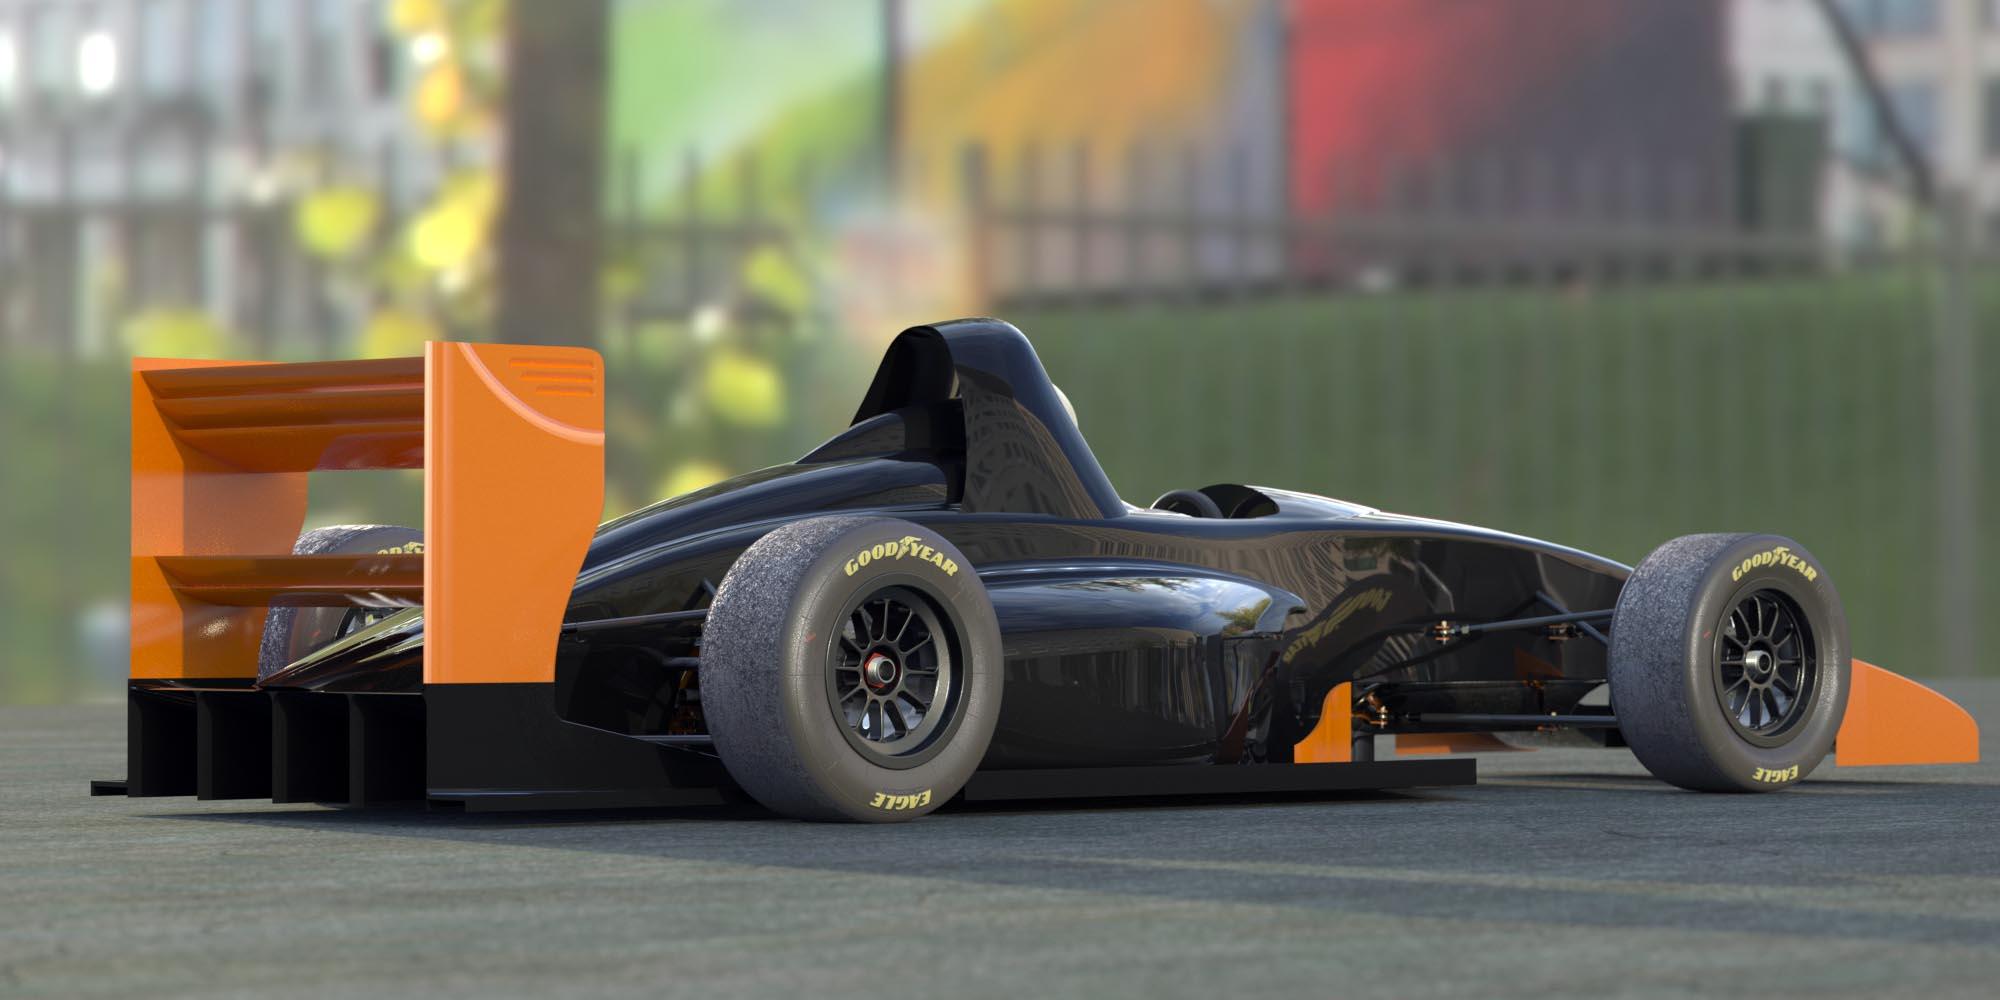 JL.12 race car